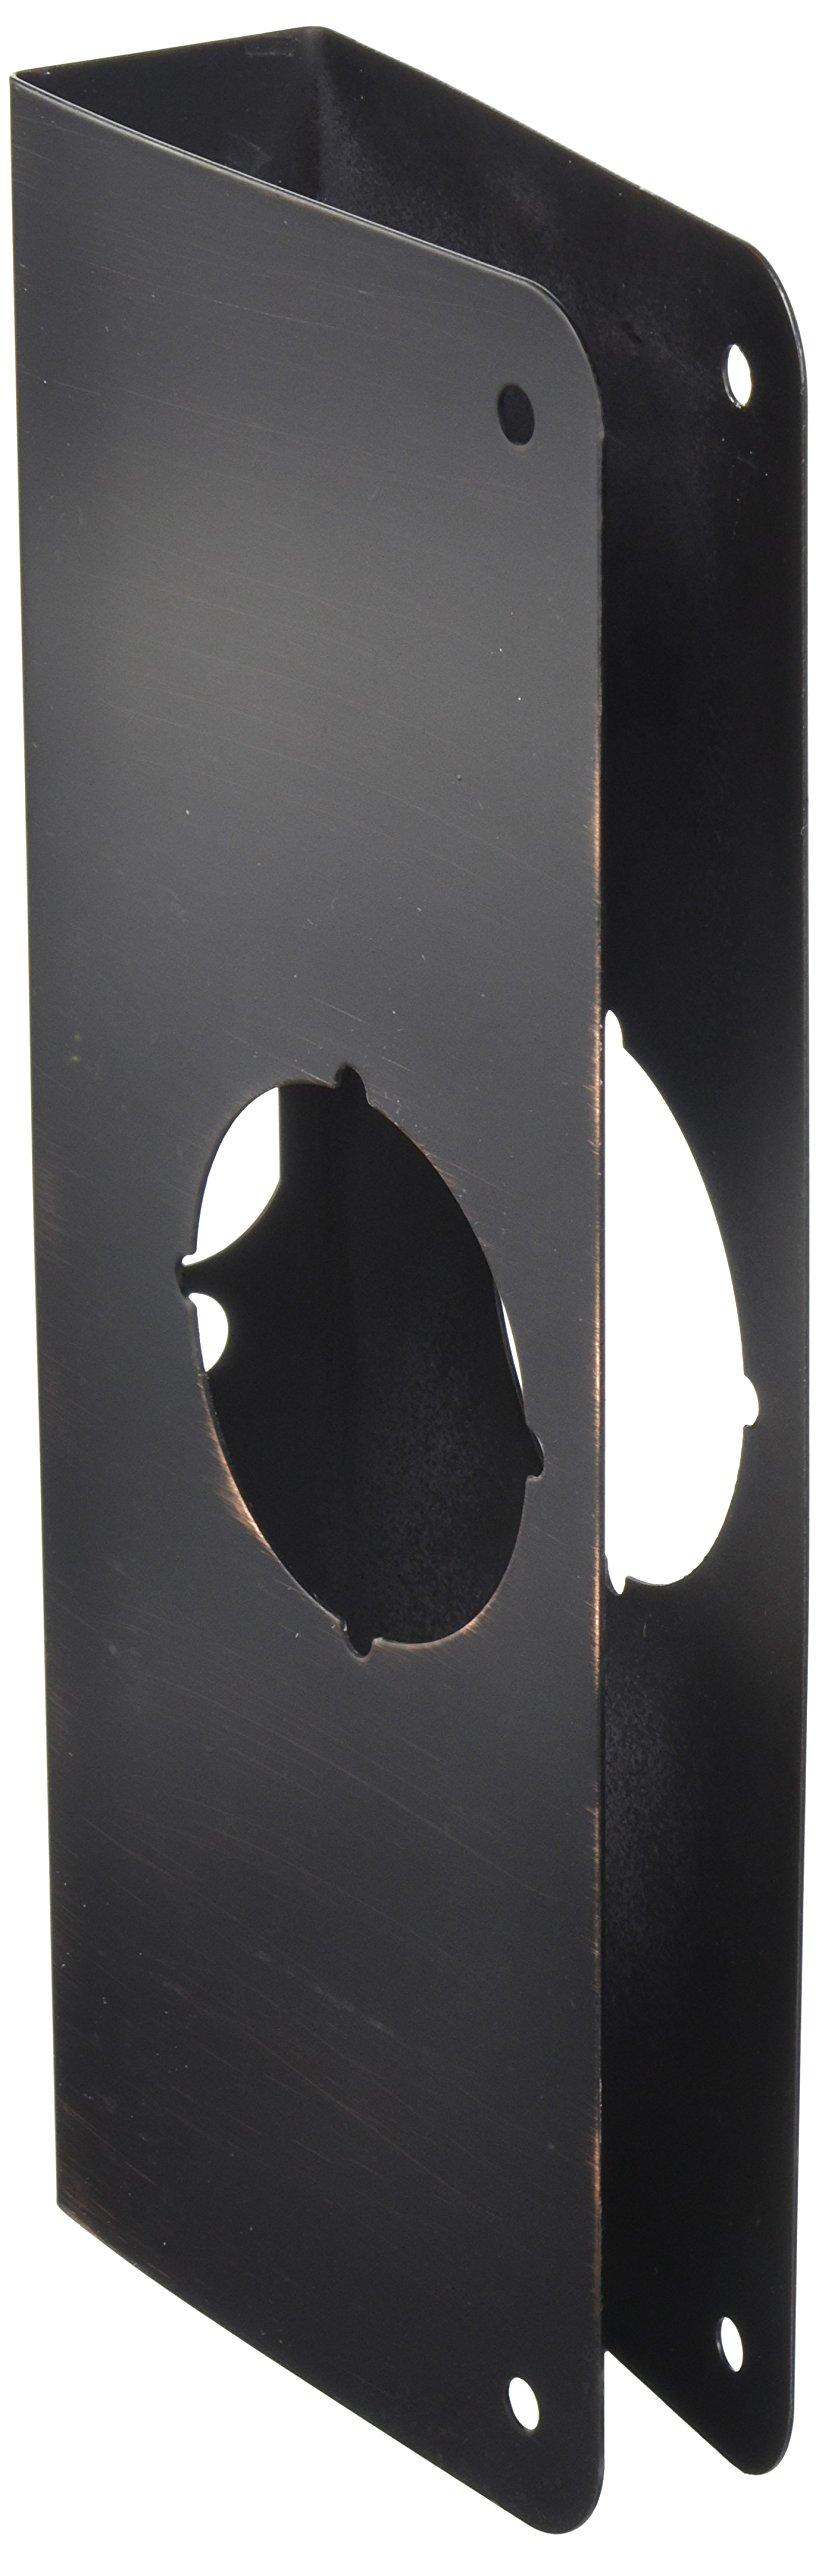 NATIONAL/SPECTRUM BRANDS HHI 2001-VB 9'' Brass Door Reinforce